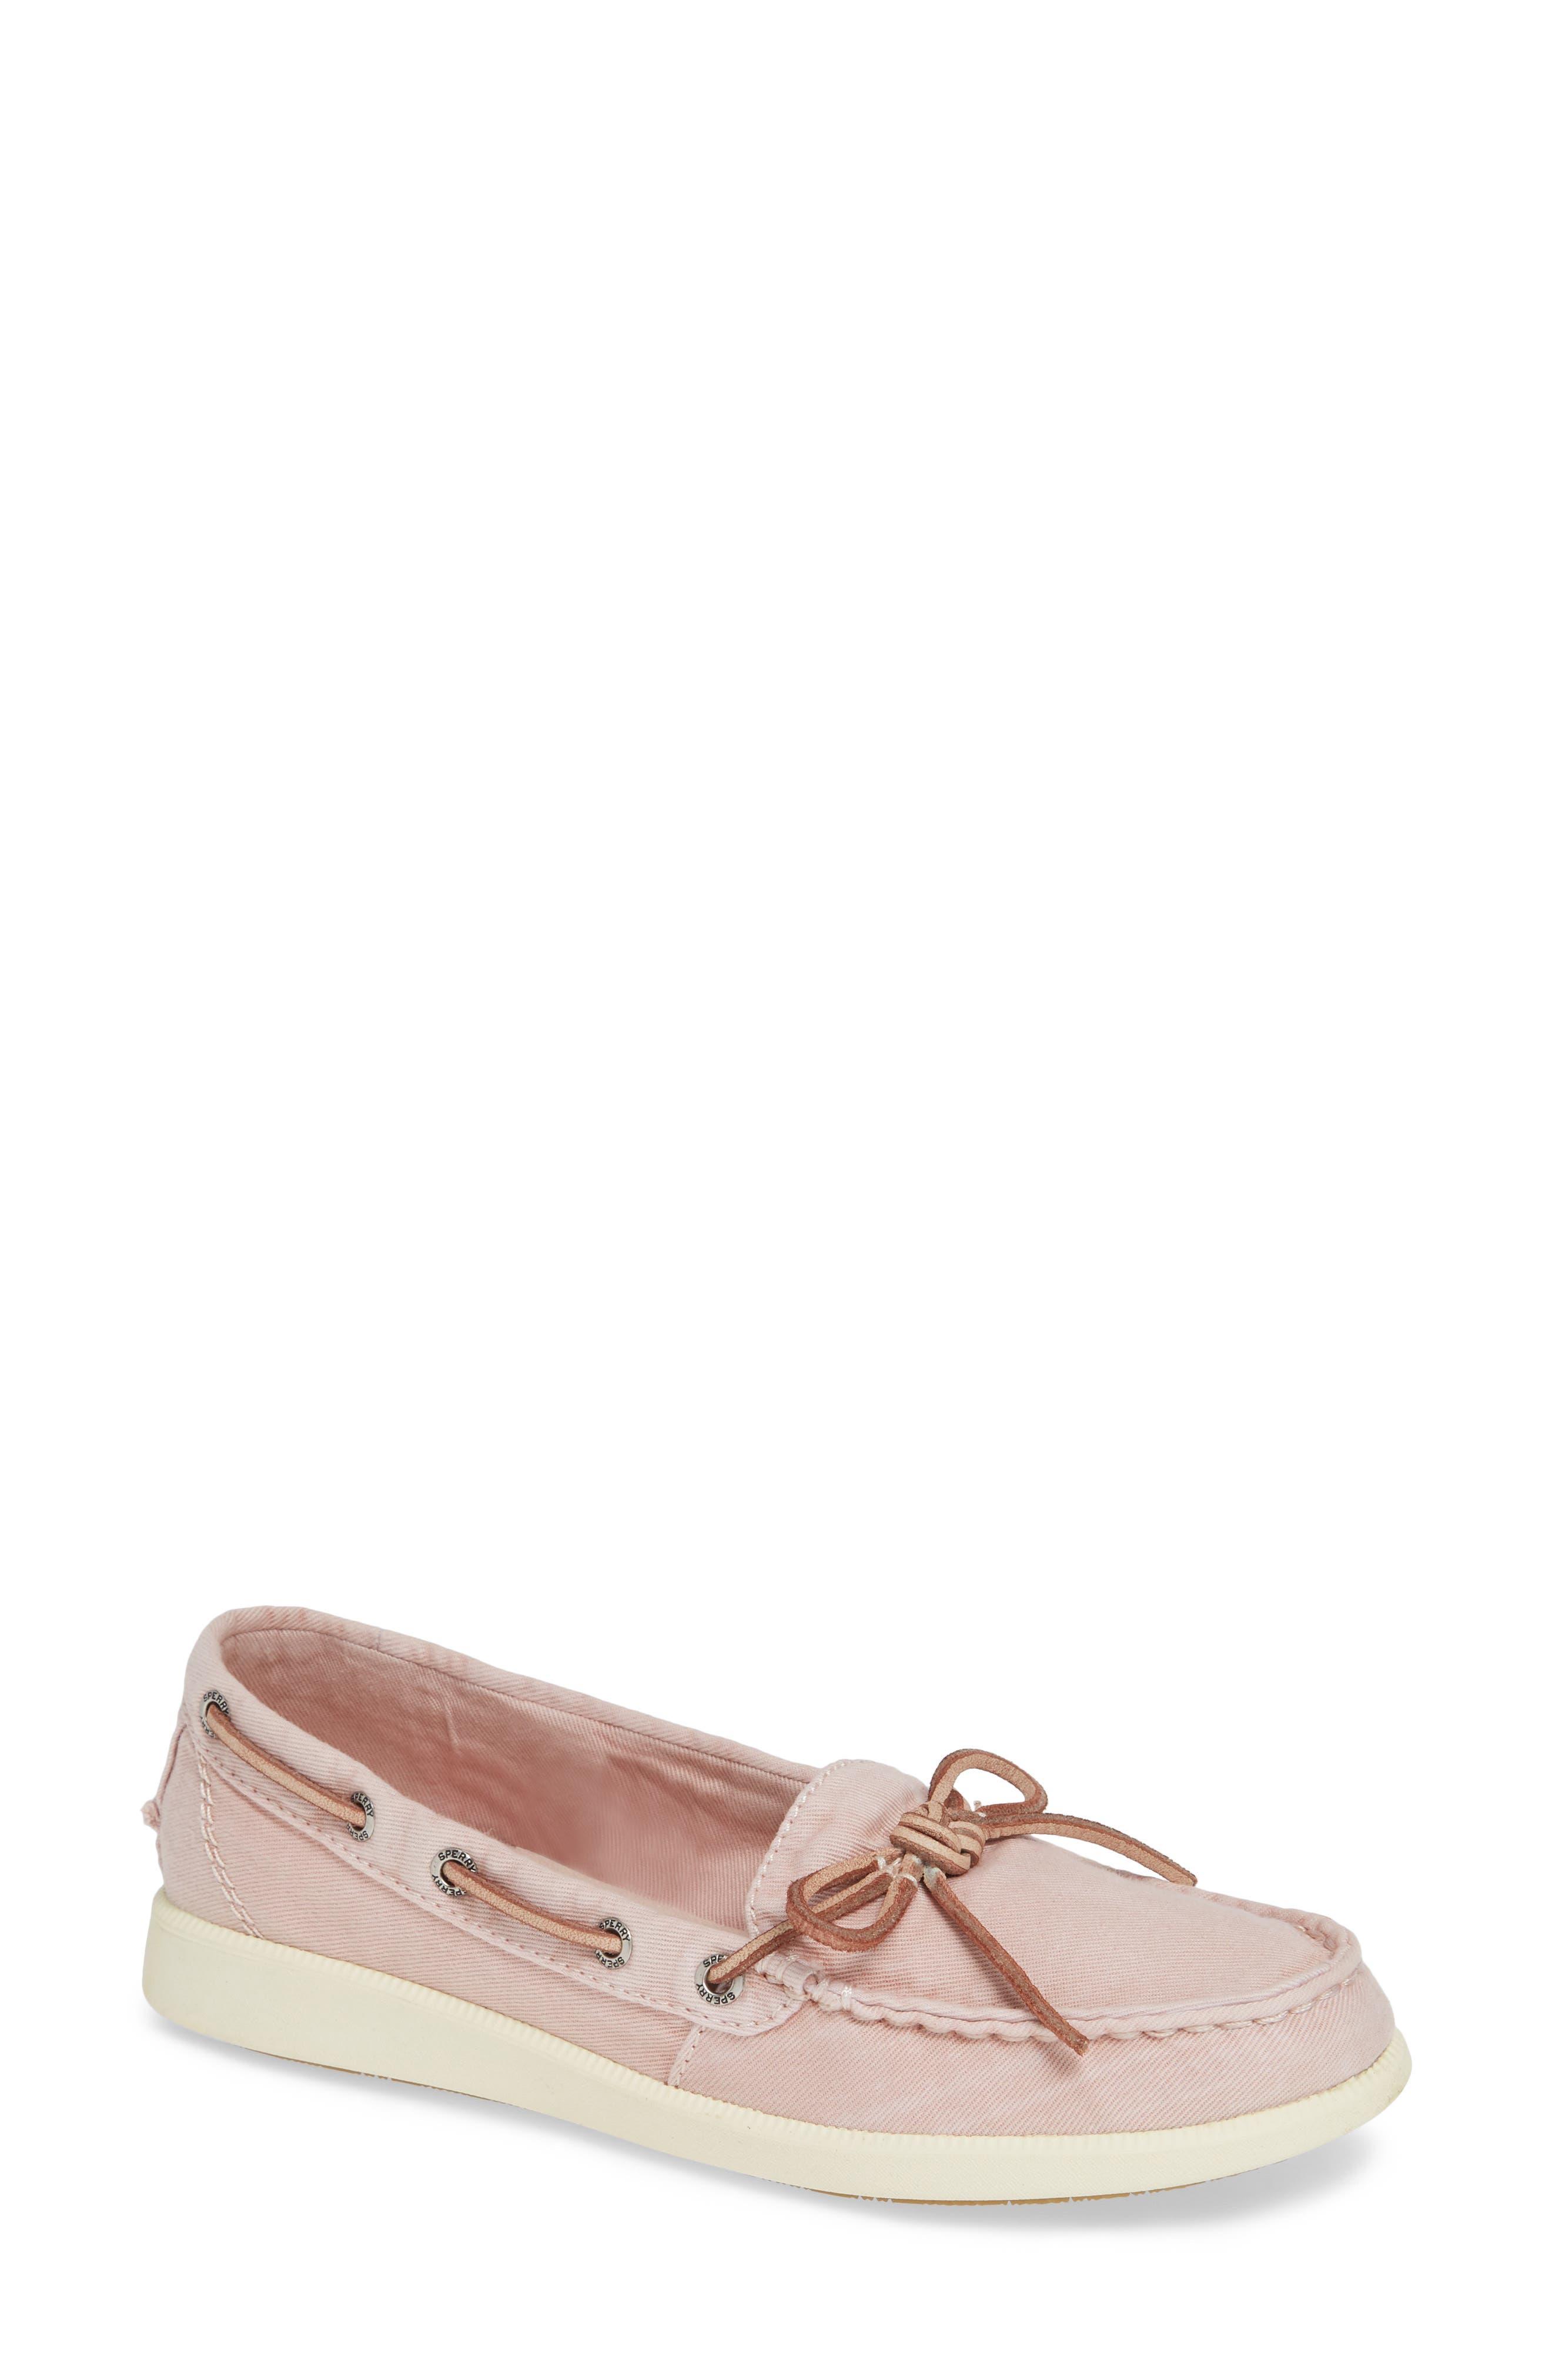 Oasis Boat Shoe,                             Main thumbnail 1, color,                             ROSE CANVAS